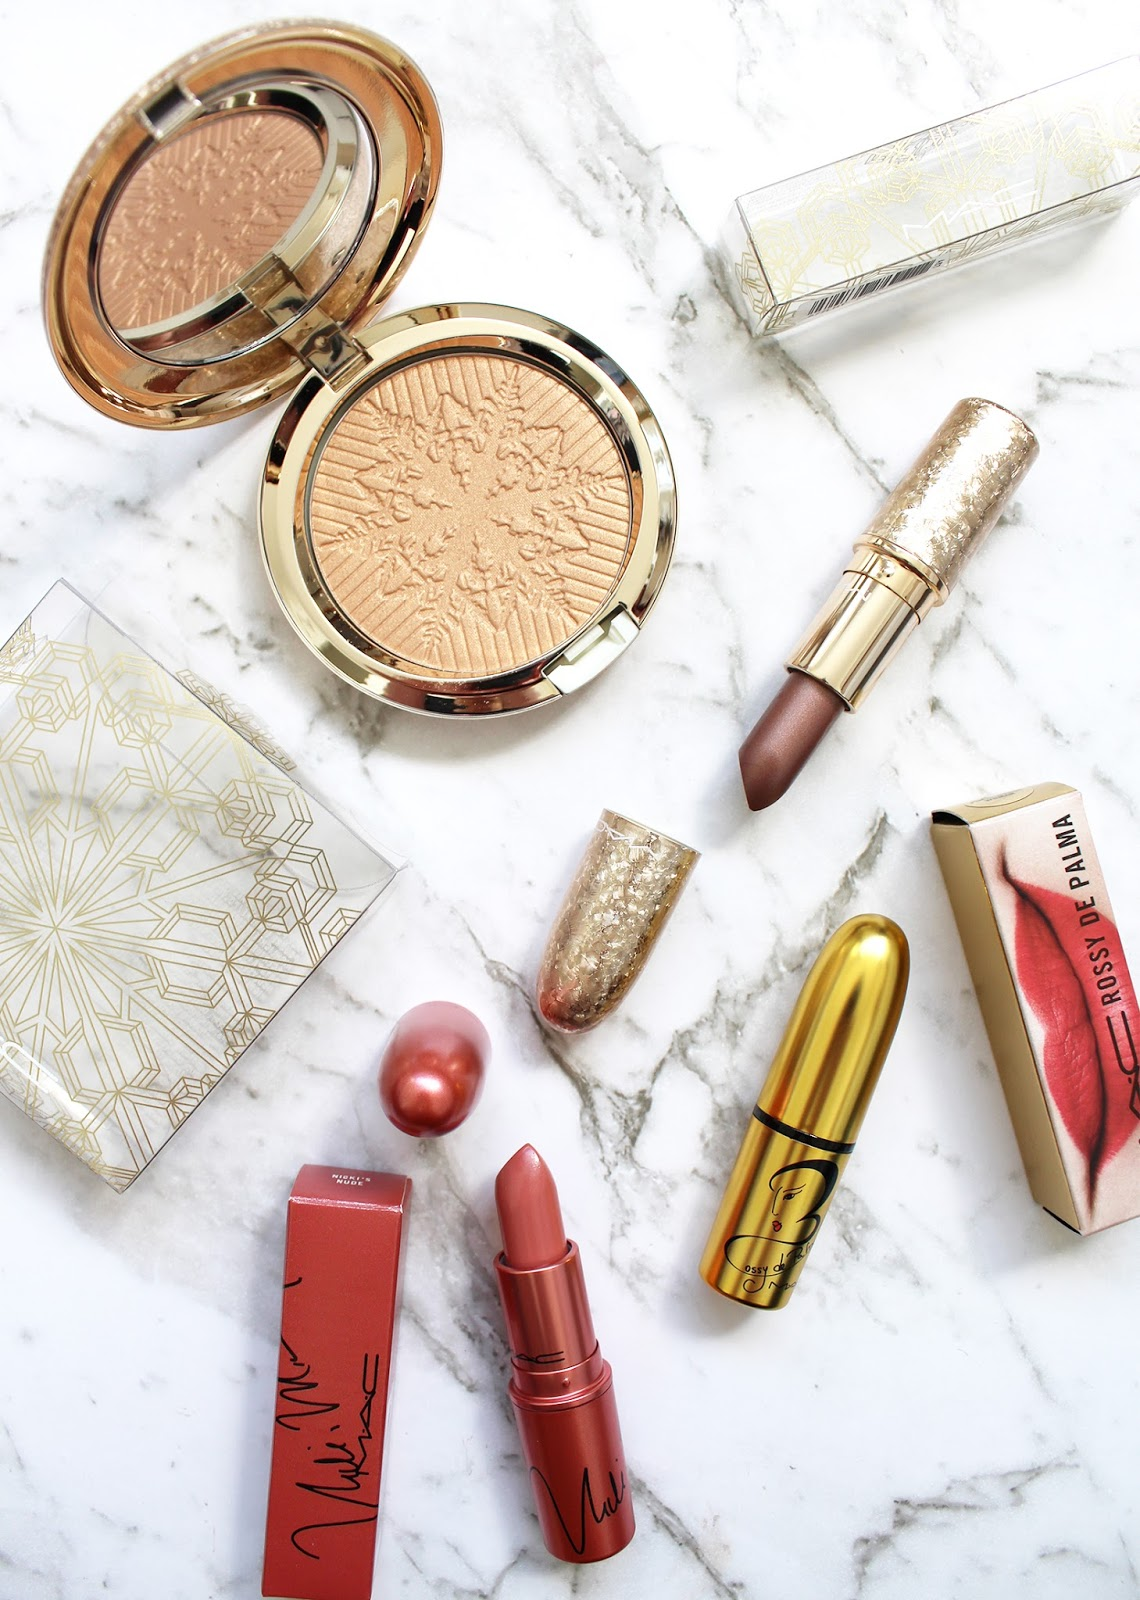 M.A.C | Haul - Holiday 2017 + Limited Edition Lipsticks - CassandraMyee